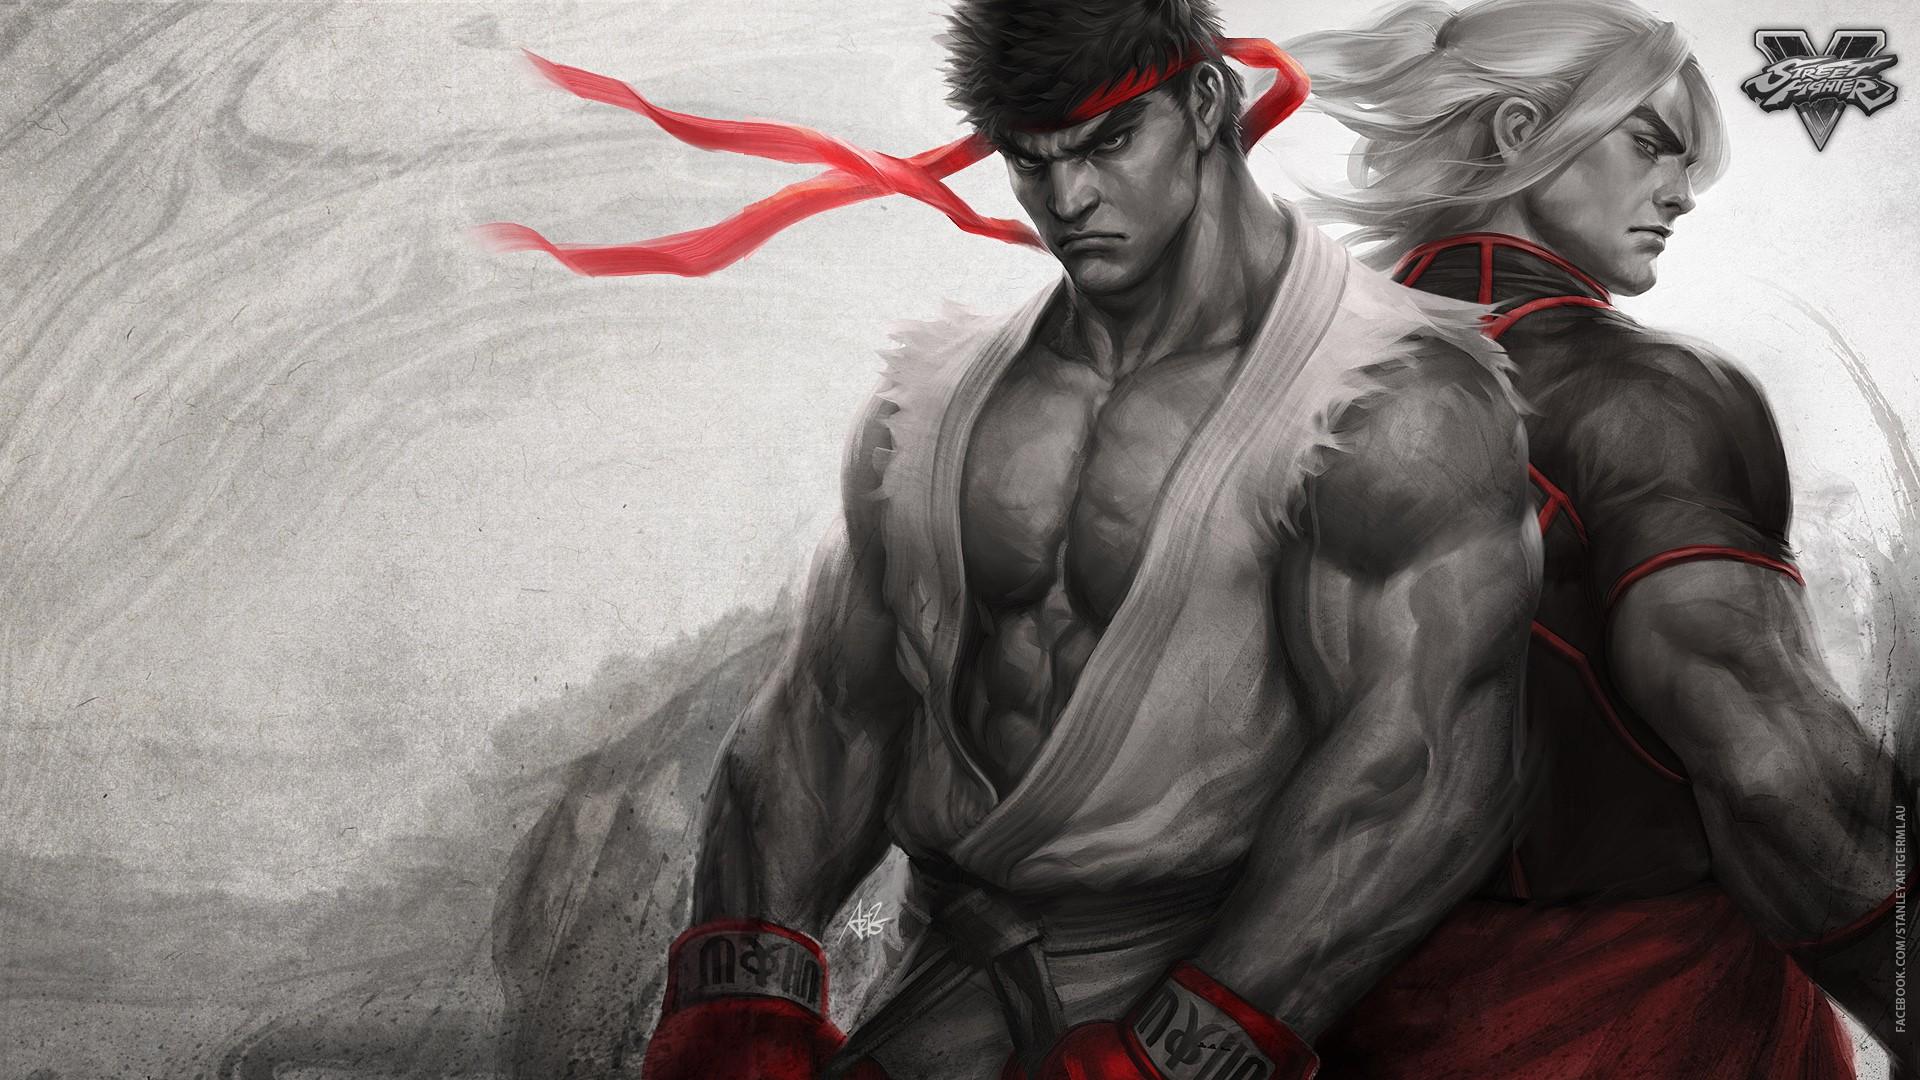 street fighter 5 wallpaper background